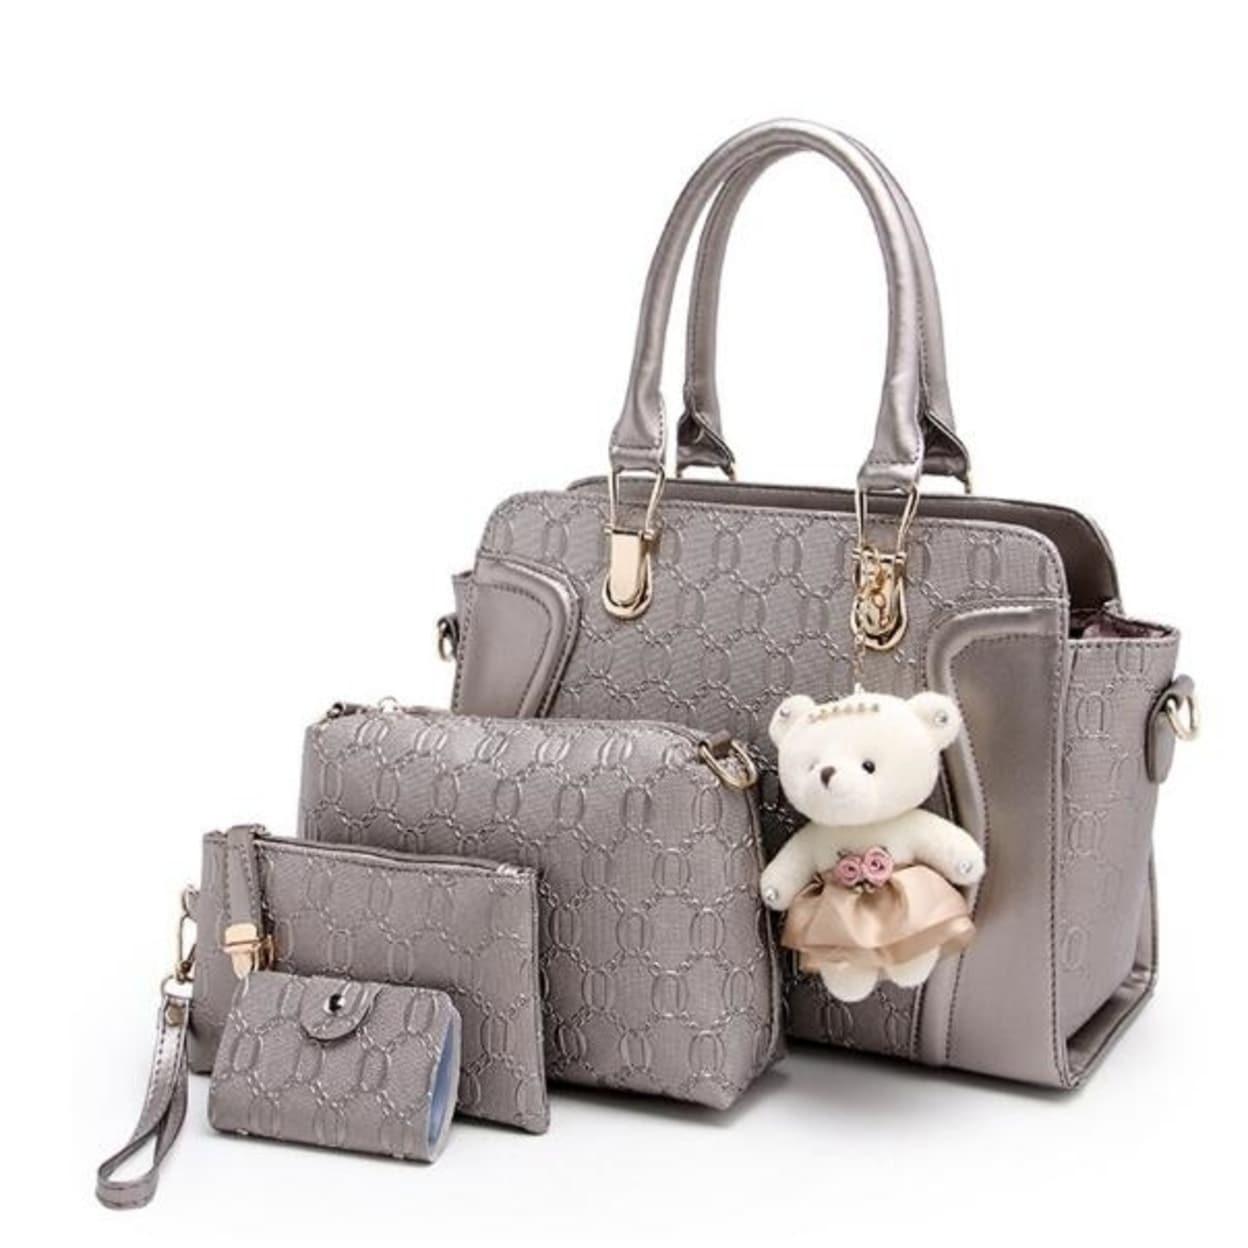 b39d4582a Shop Vogue Women's PU Leather Shoulder Bags Designer Messenger Bags Ladies  Handbag Women's Clutch Handbags Purses Wallets - Free Shipping Today -  Overstock ...